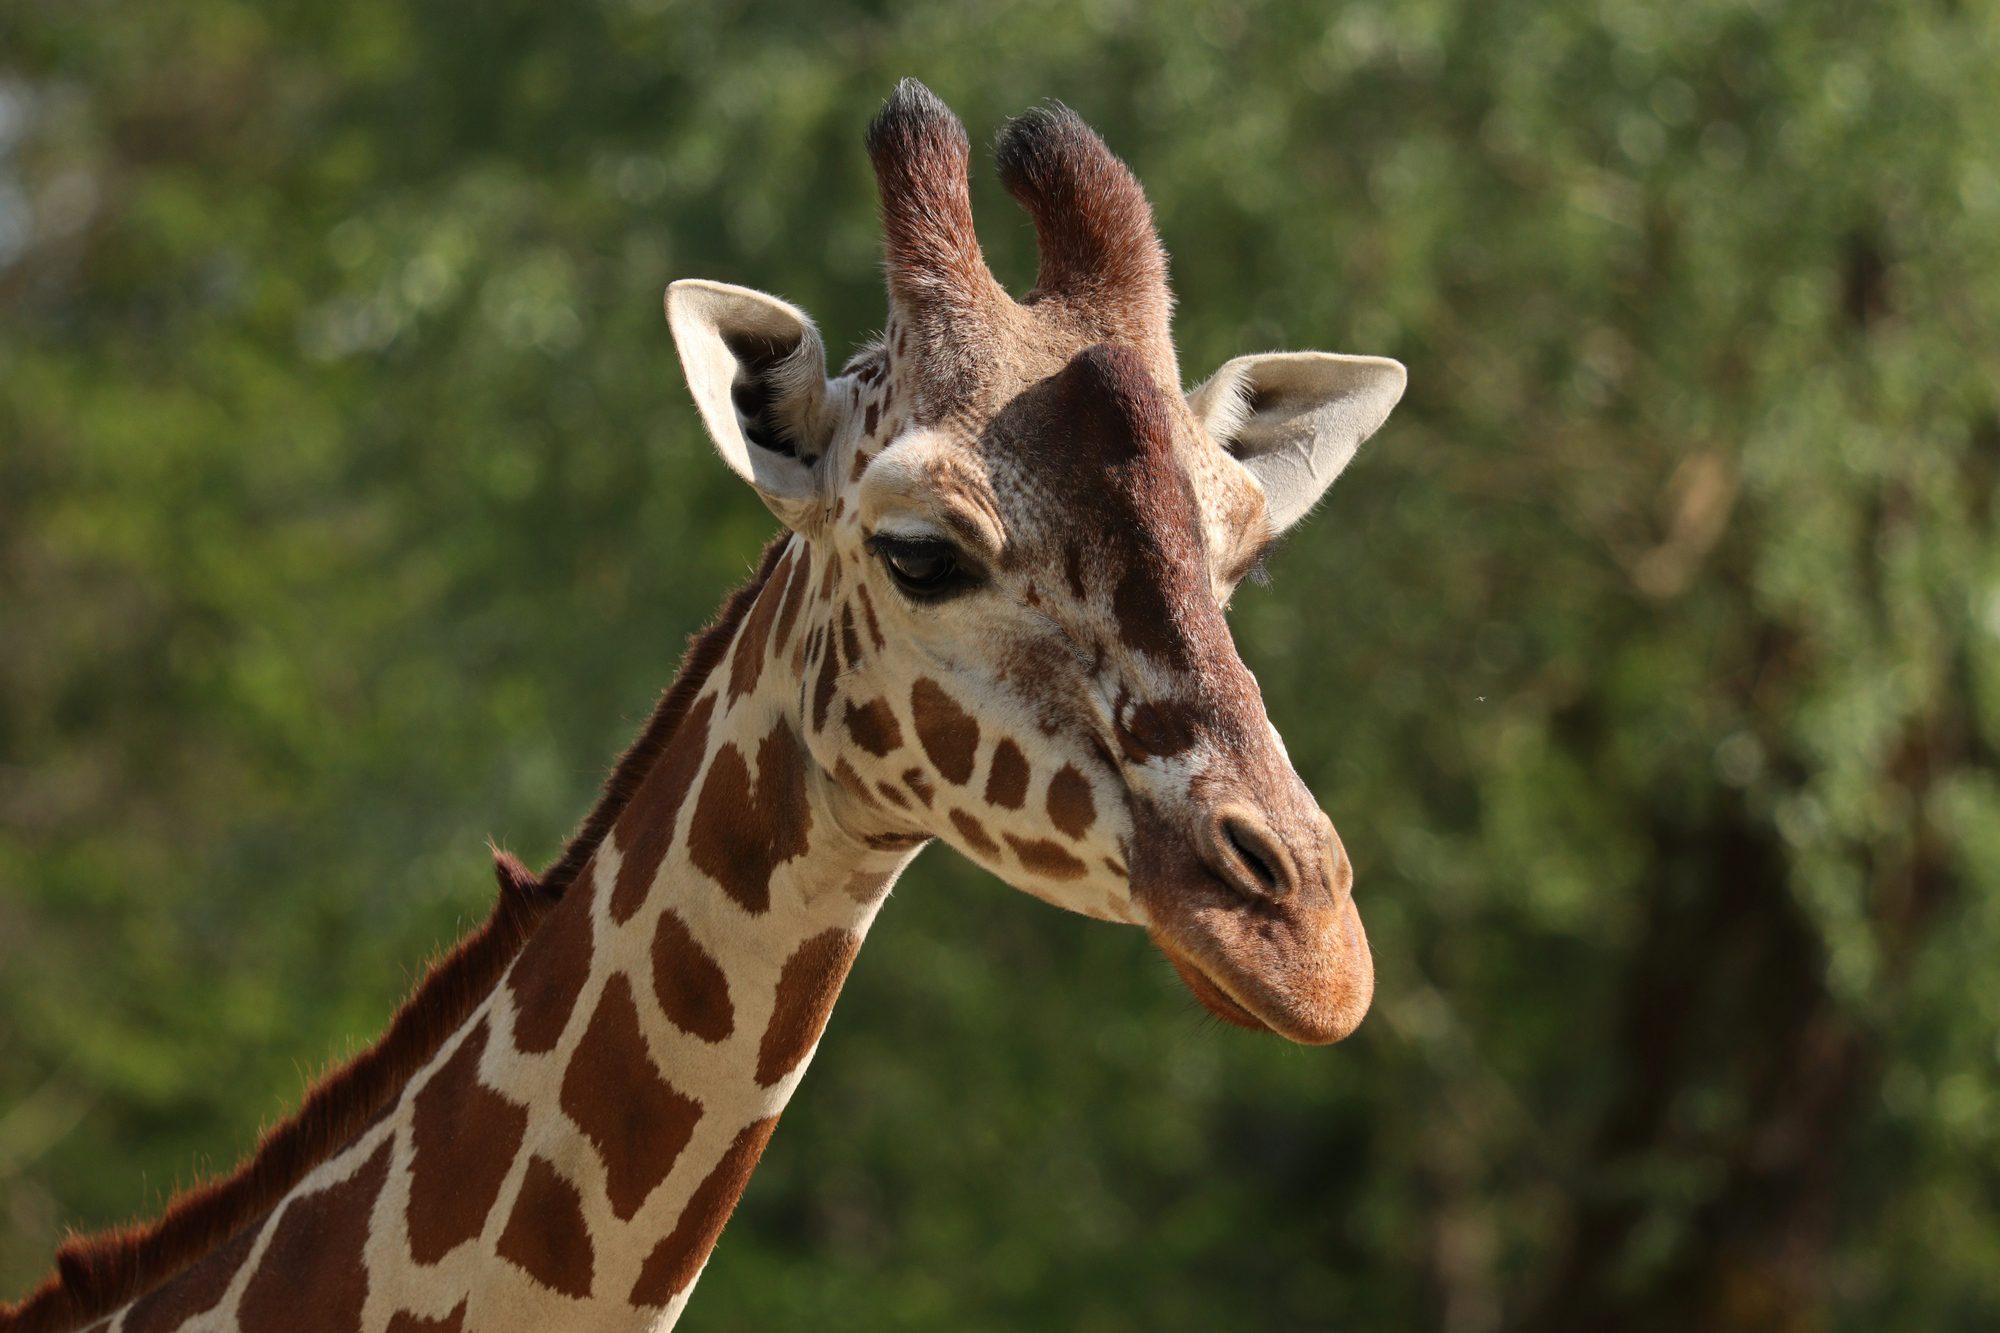 Netzgiraffe Bahati im Tierpark Hellabrunn